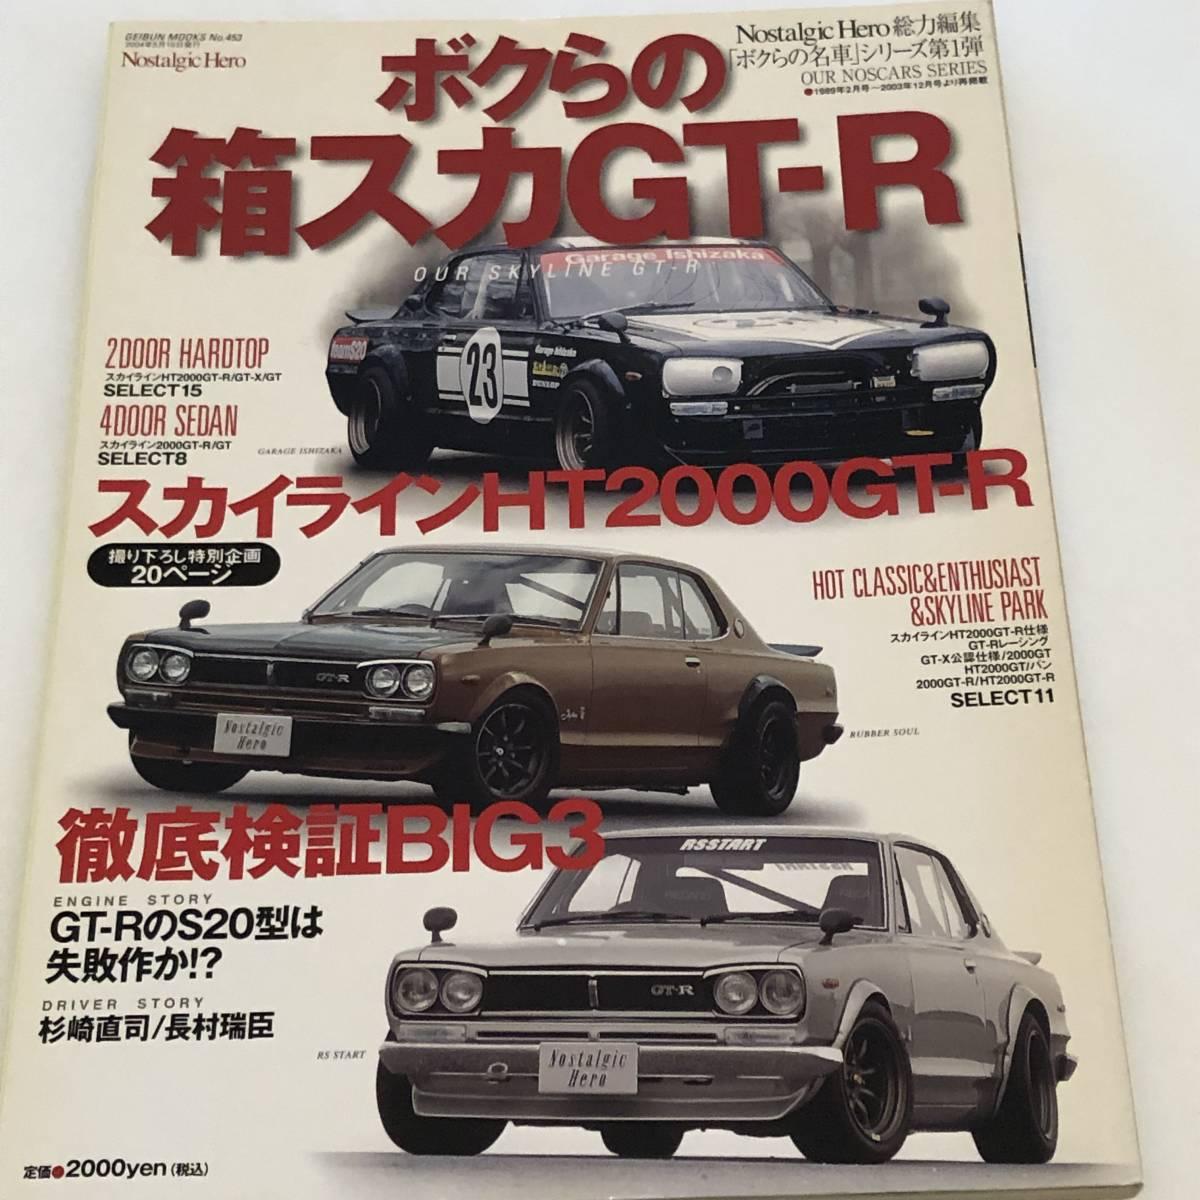 Nostalgic hero総力特集 箱スカGT-R/スカイラインHT2000GT-R/杉崎直司/長村瑞臣/S20型エンジンストーリー_画像1